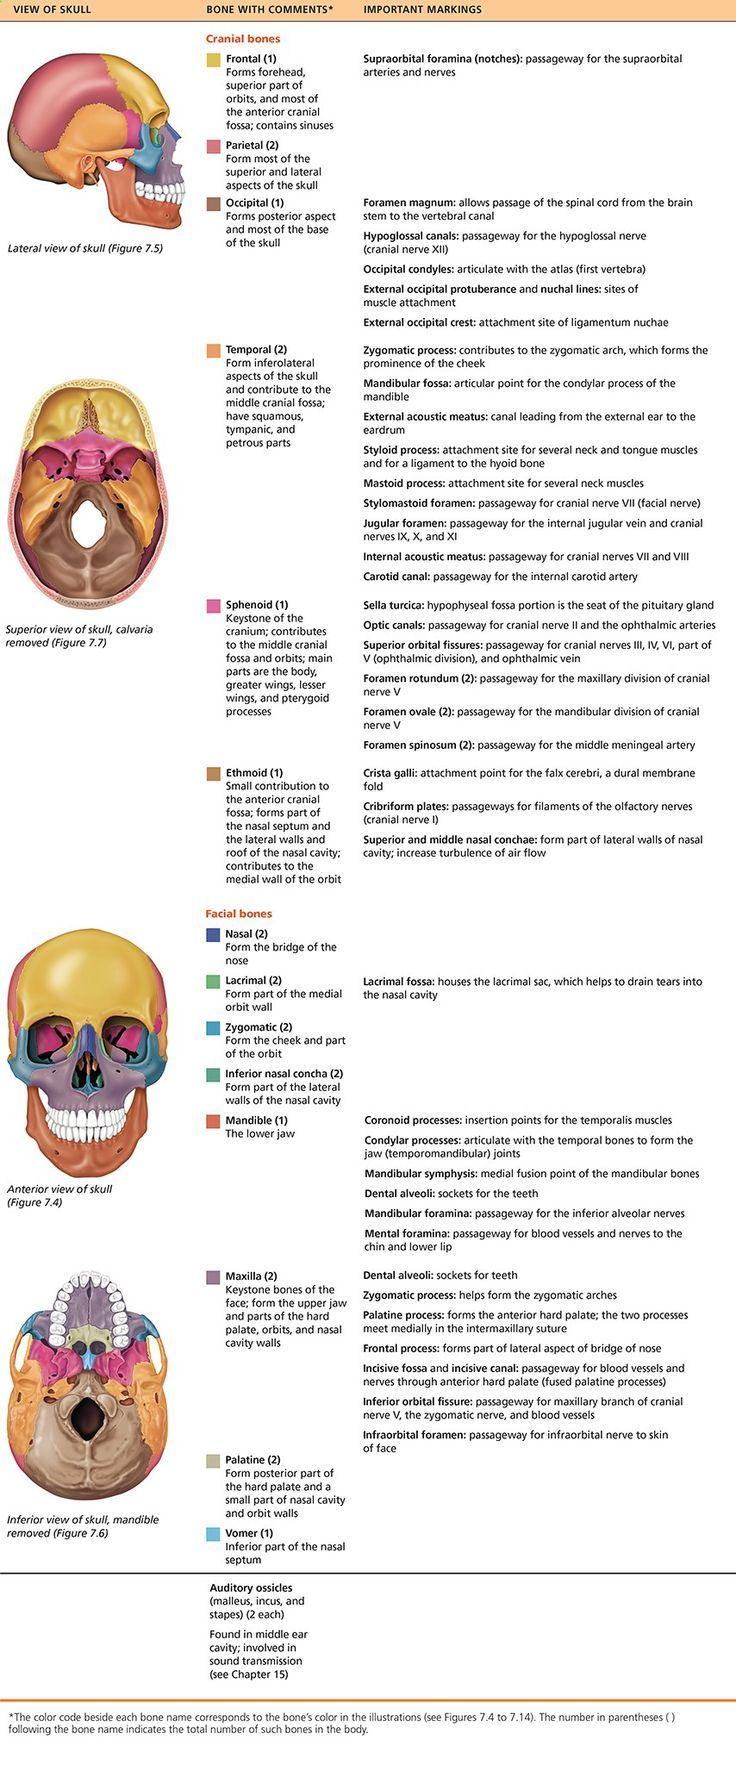 Part 1 The Axial Skeleton 7 1 The Skull Consists Of 8 Cranial Bones And 14 Facial Bones Human A Anatomia Dental Anatomia Medica Anatomia Y Fisiologia Humana